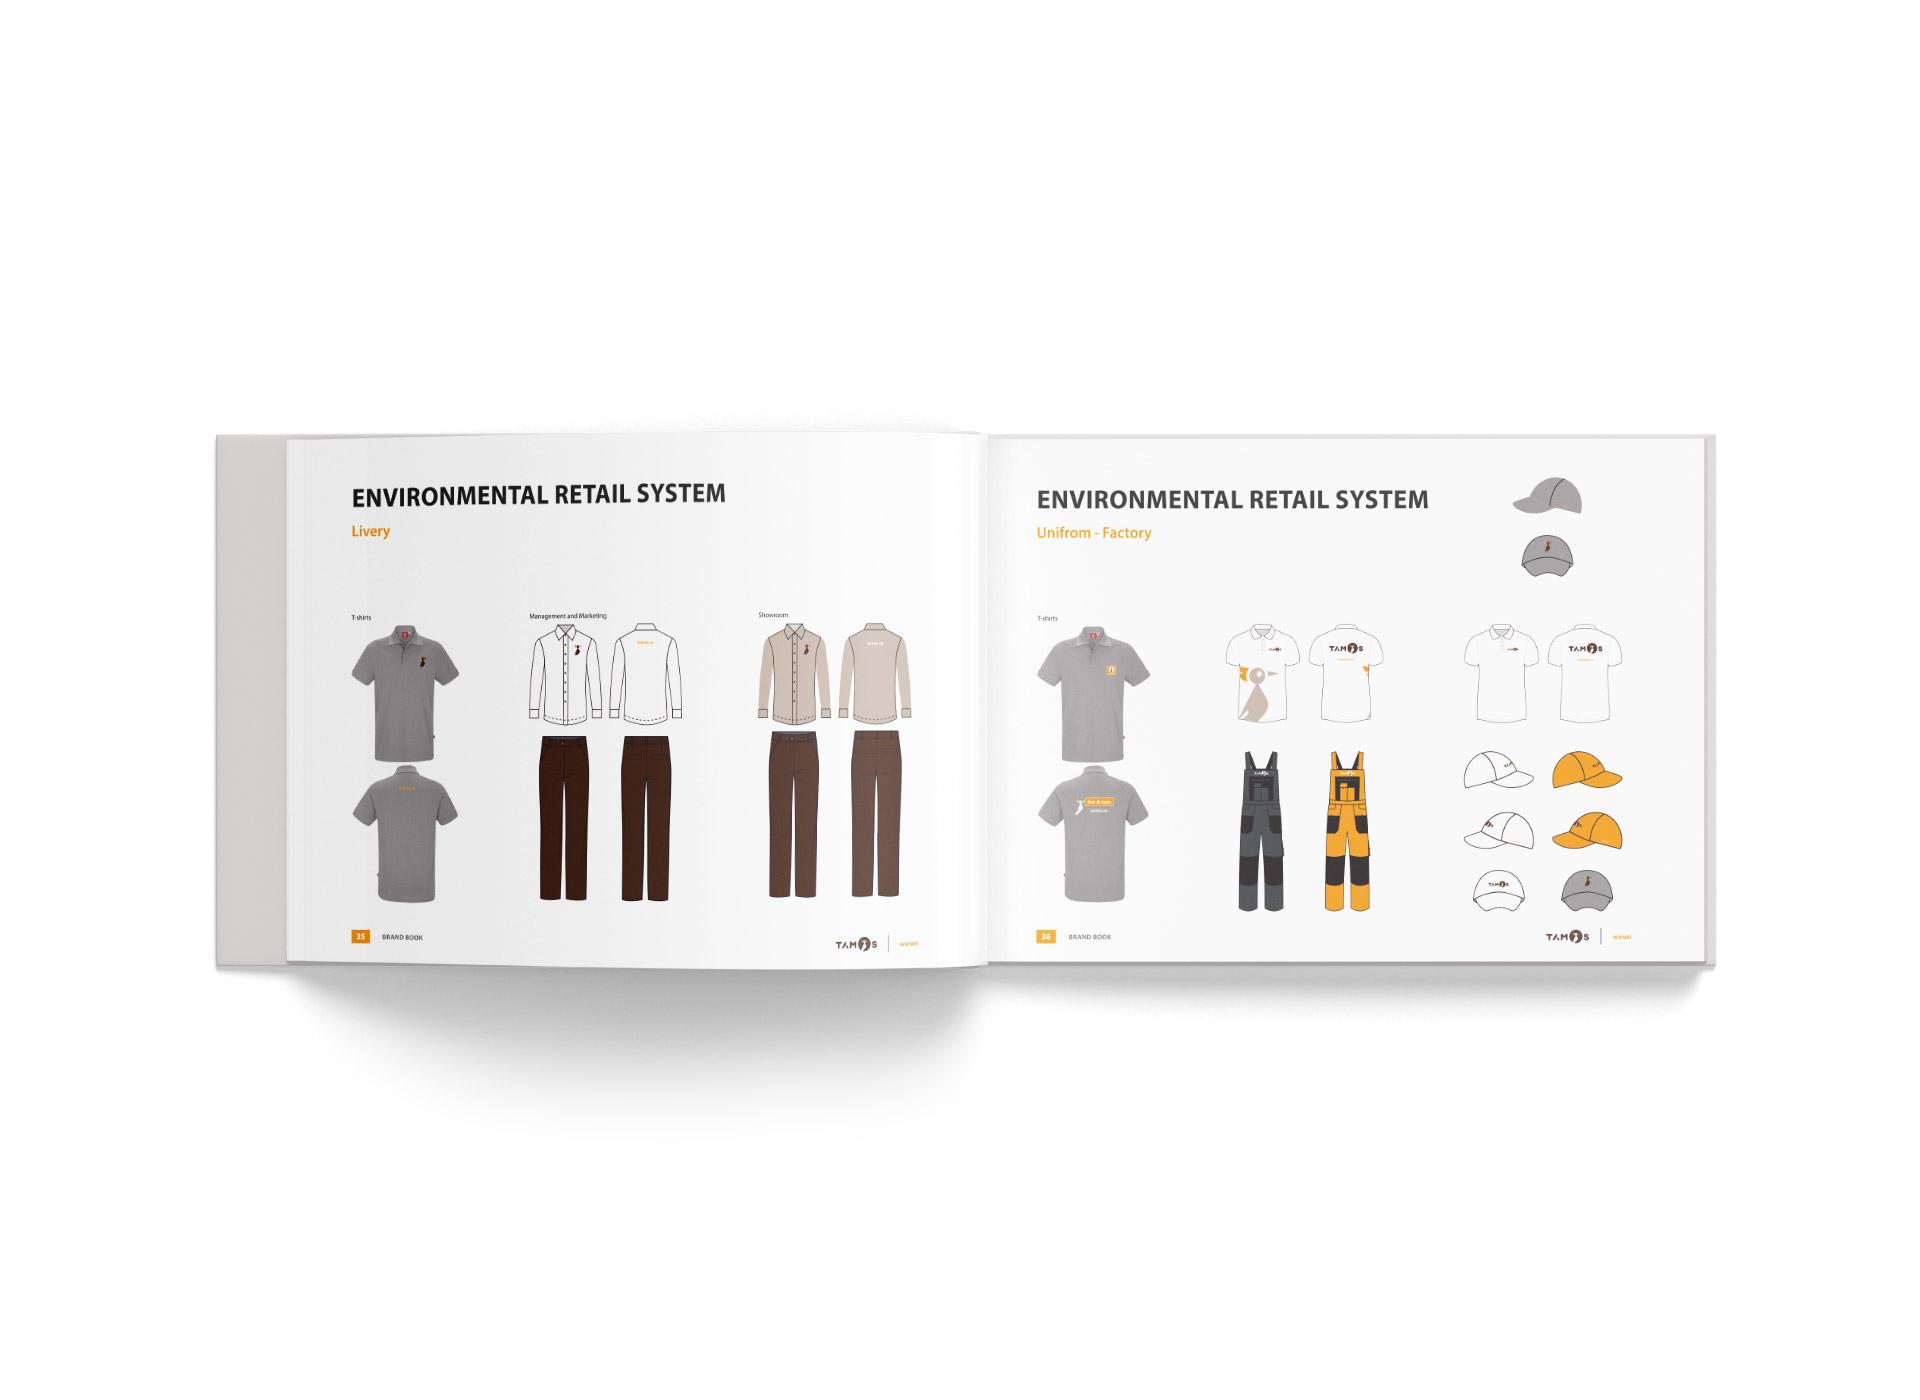 tamos portofoliu inoveo brand book